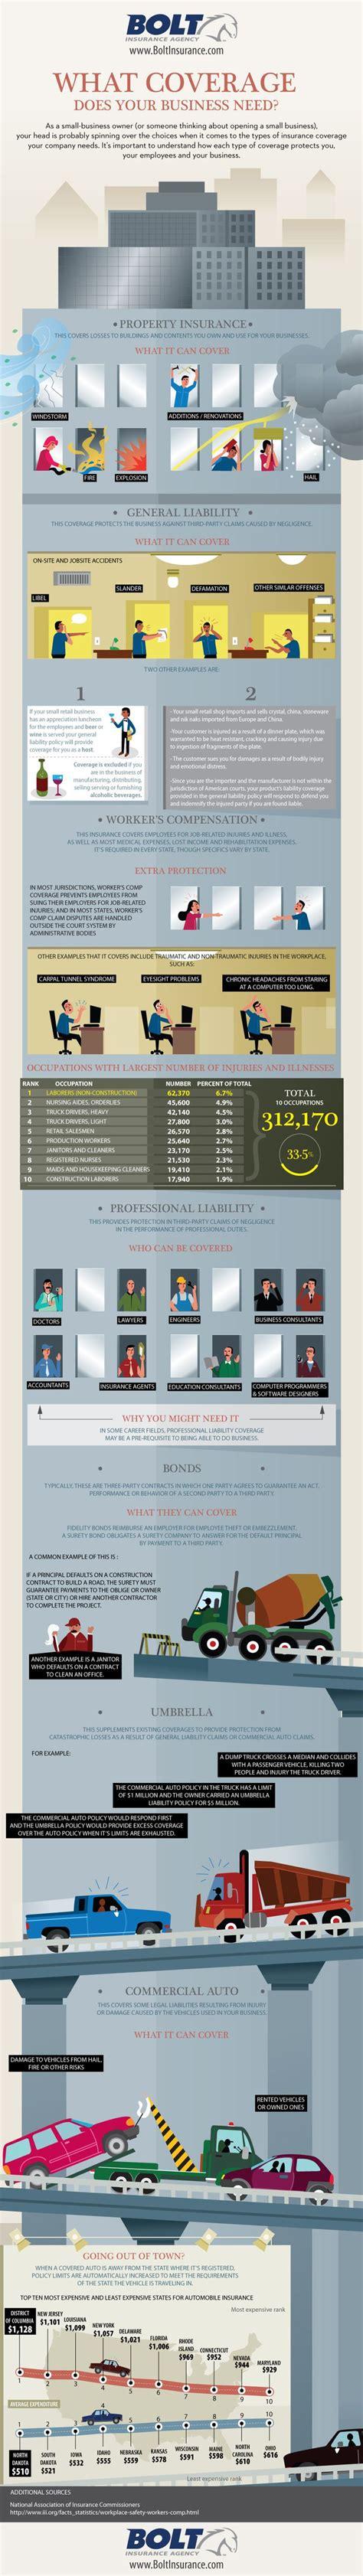 Best 25+ Commercial insurance ideas on Pinterest